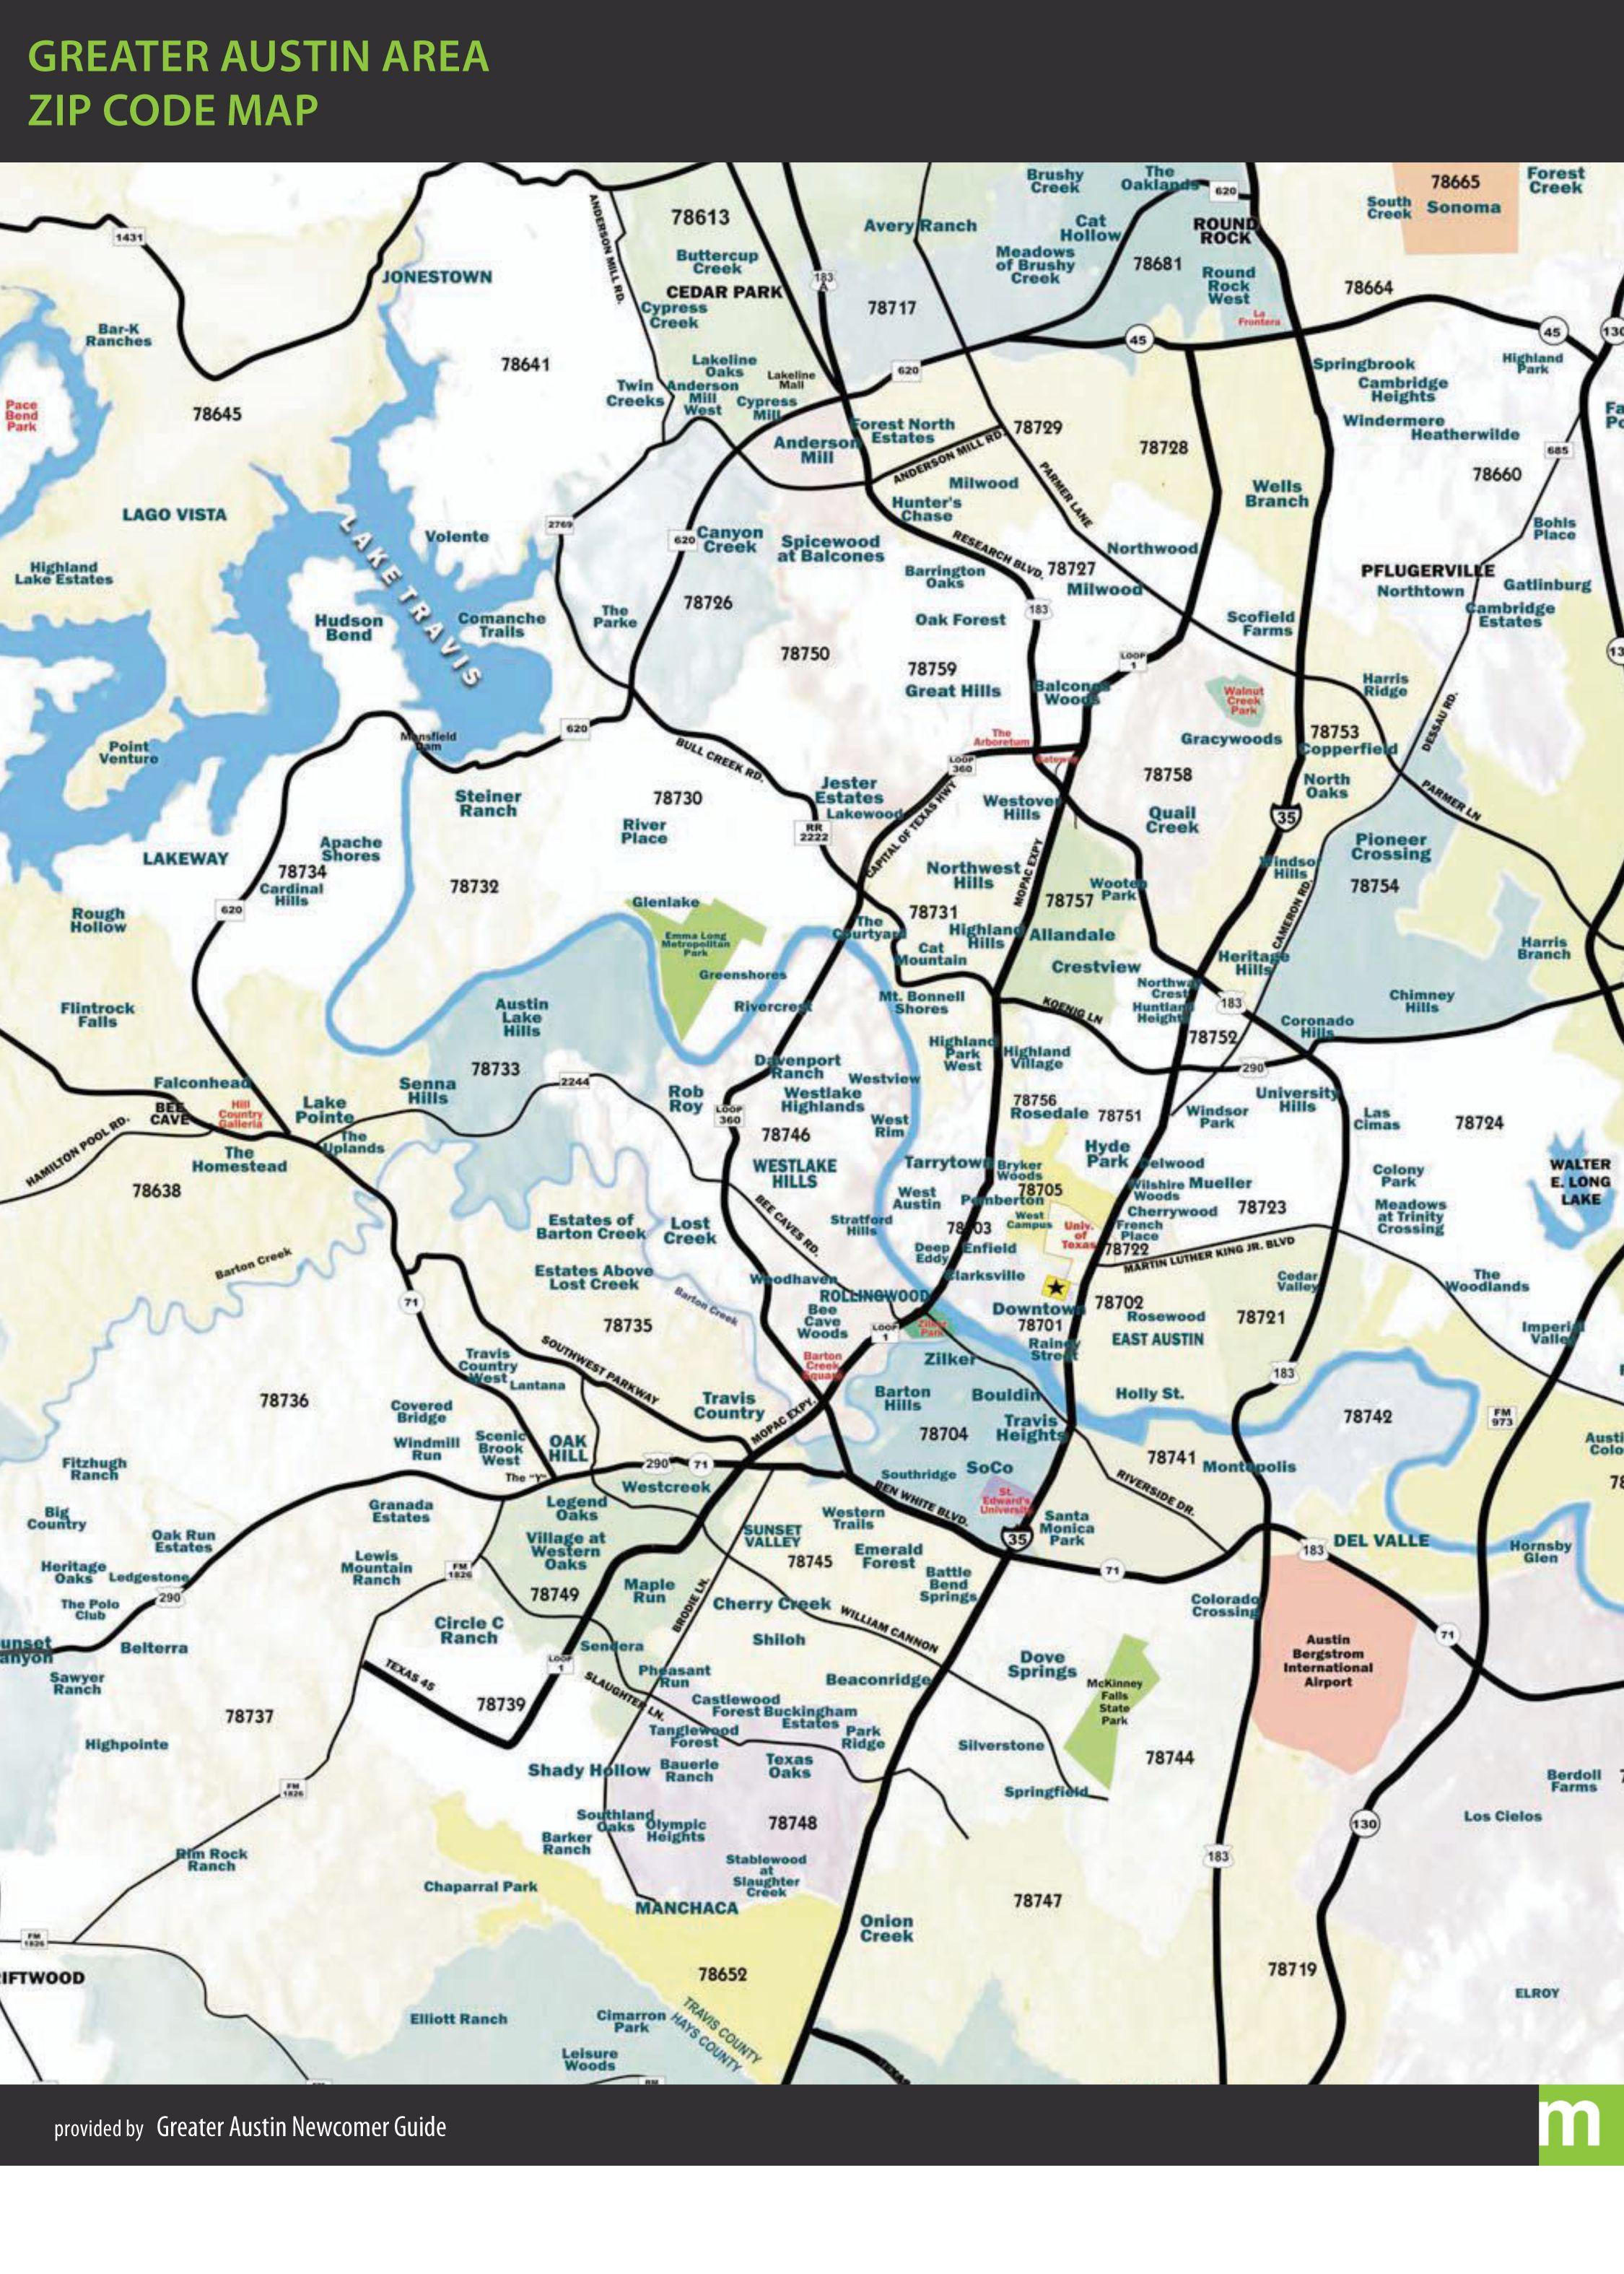 greater austin zip code map more maps pinterest zip code map